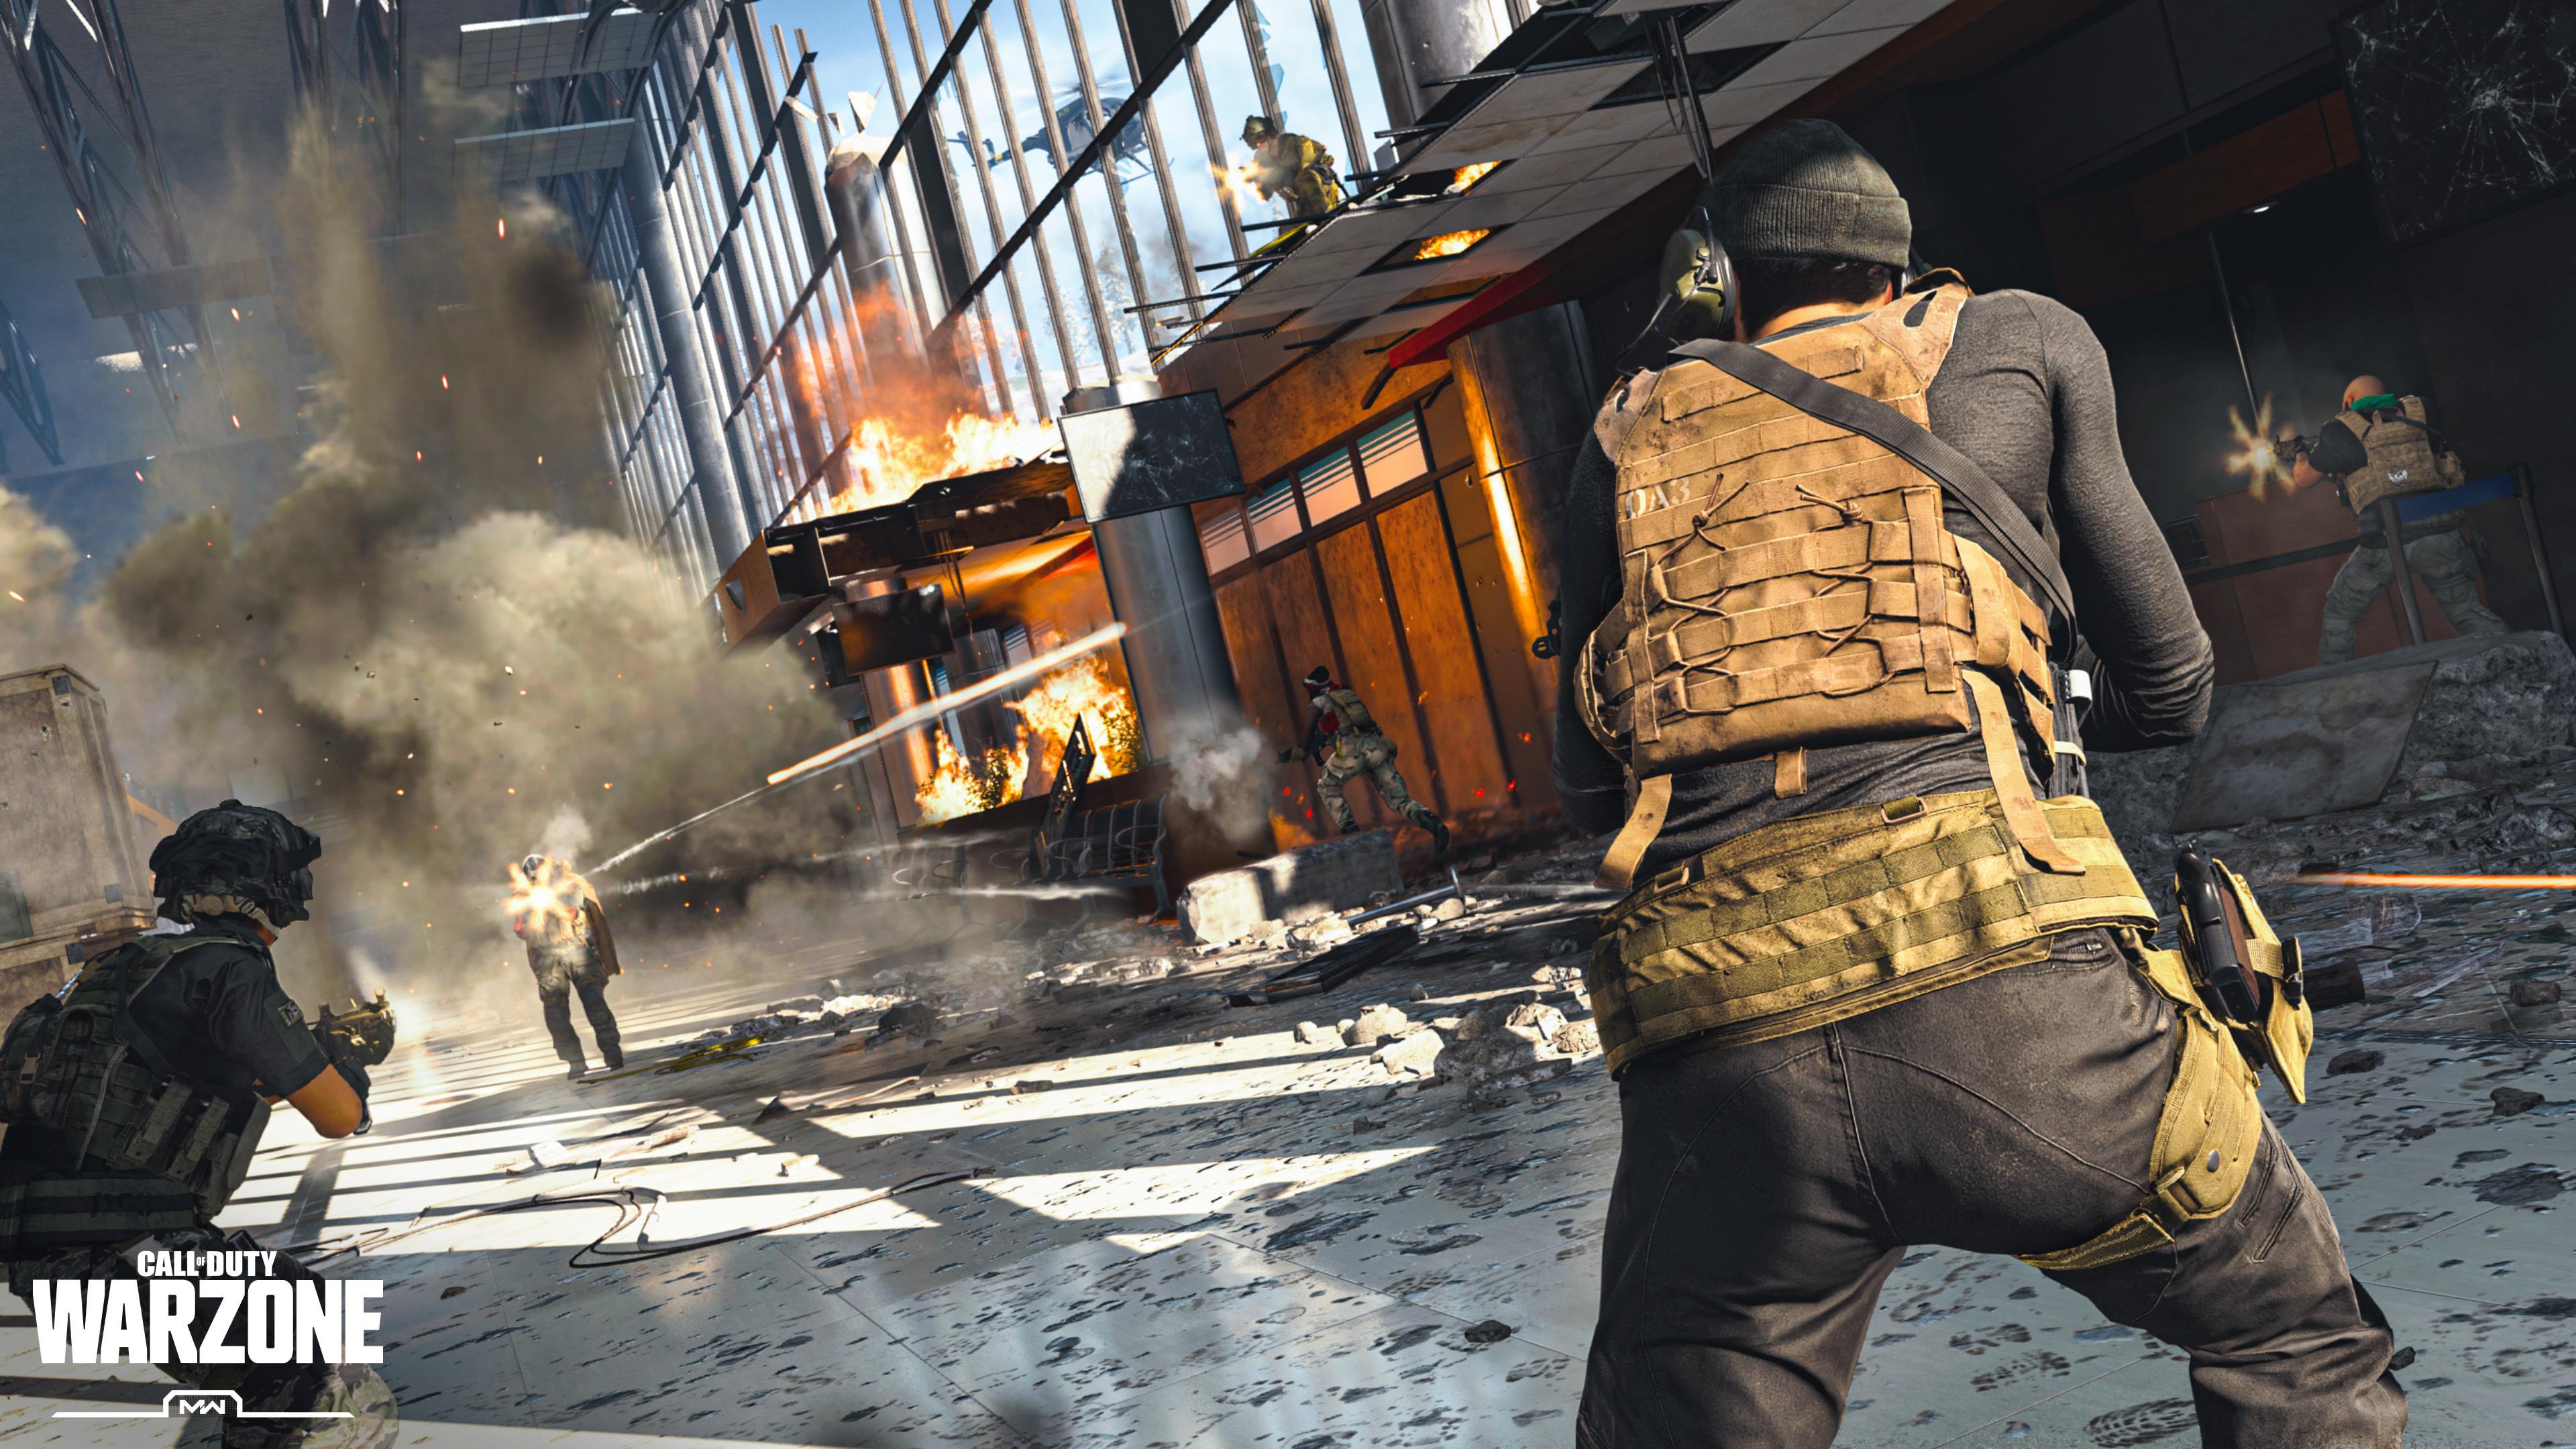 Разработчики Call of Duty: Warzone удалили всю технику в игре из-за эксплойта